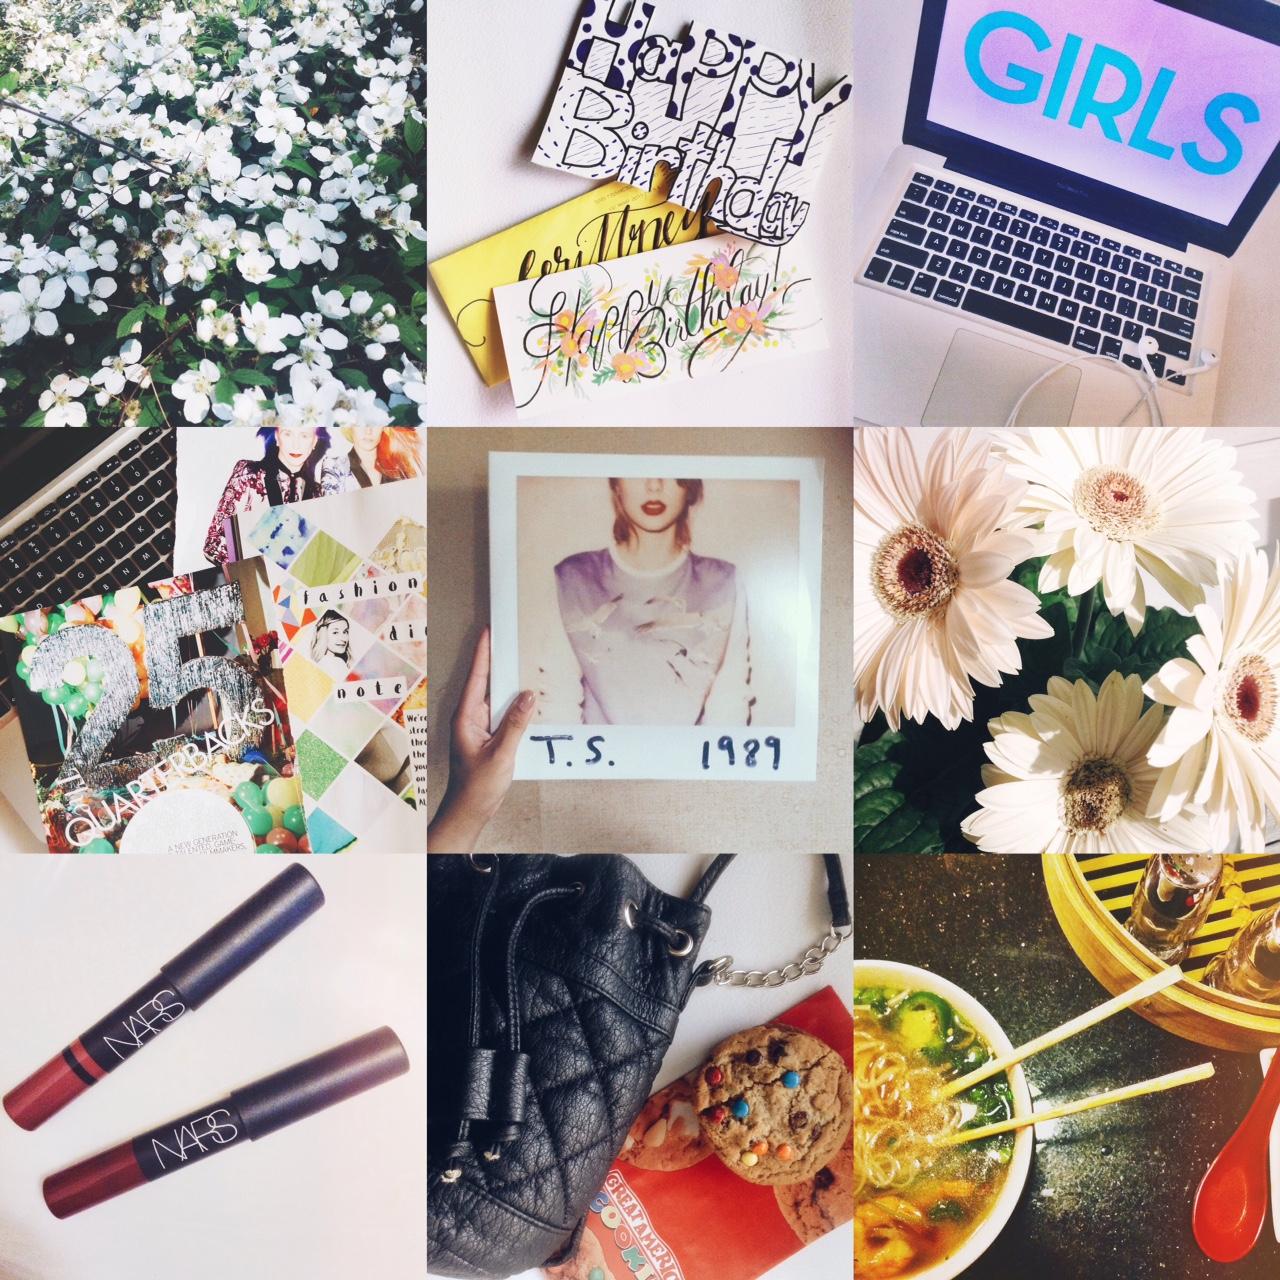 Follow me on Instagram here.